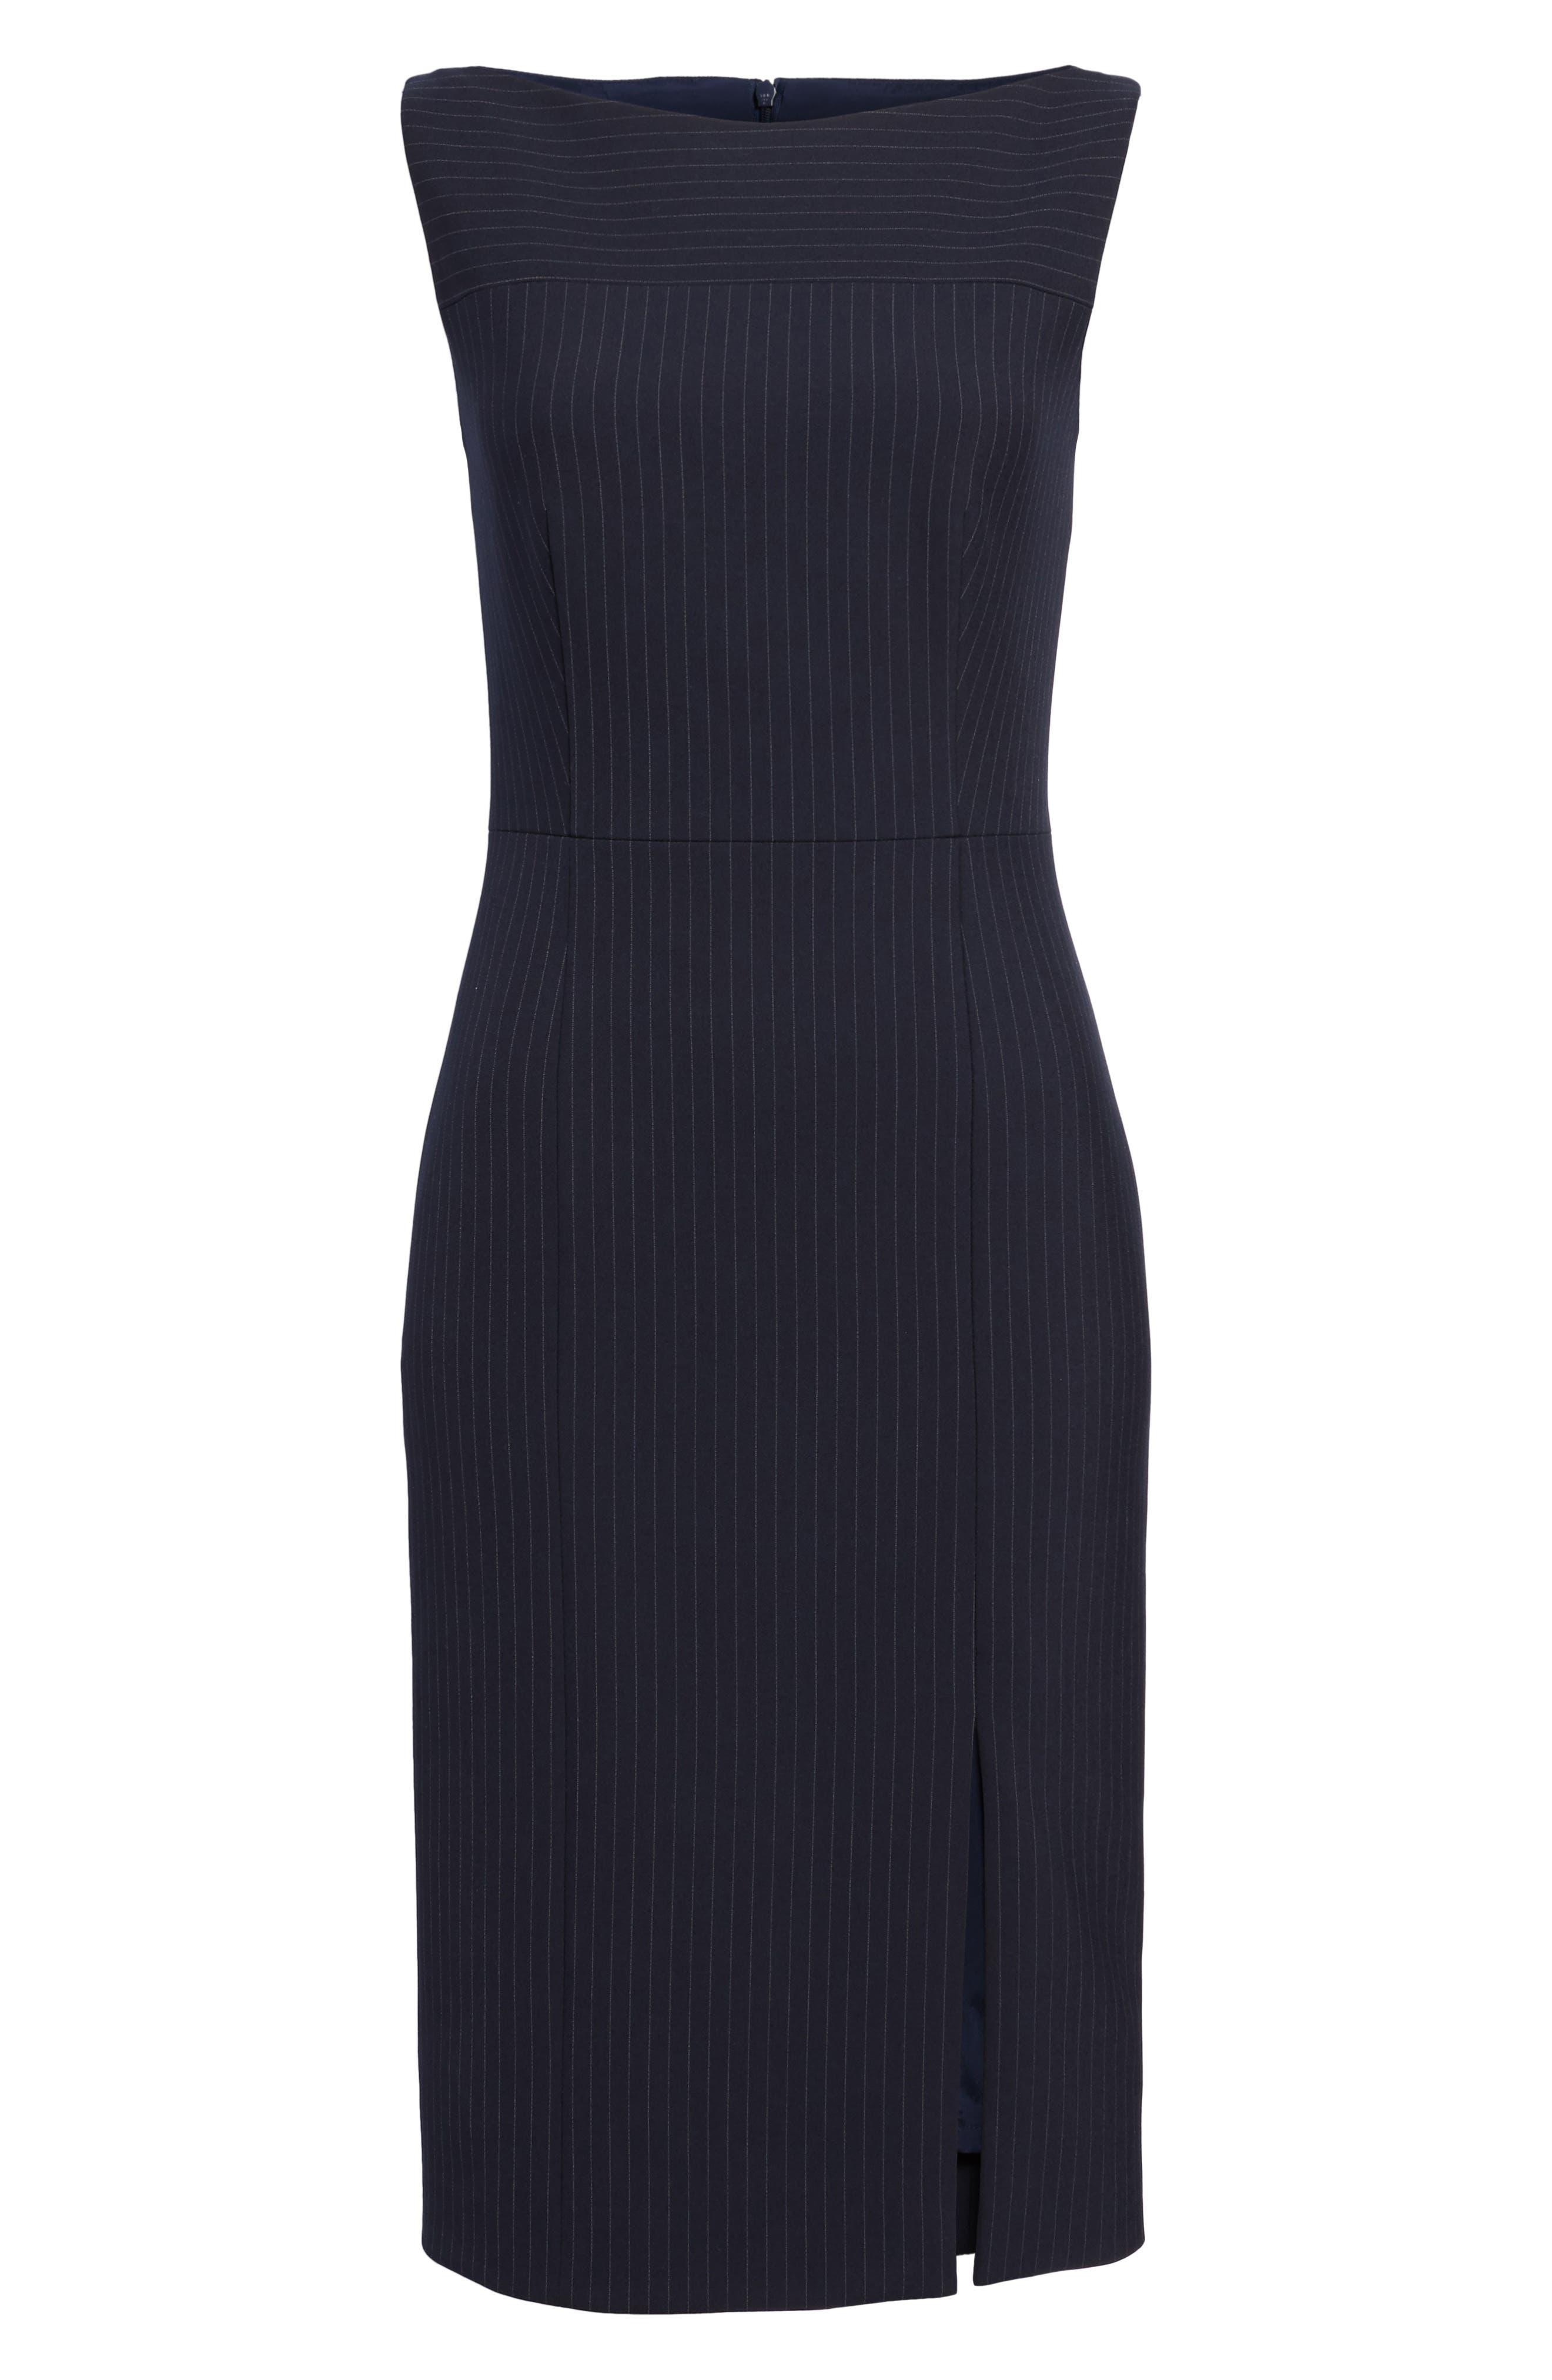 Denaka Pinstripe Sheath Dress,                             Alternate thumbnail 6, color,                             462